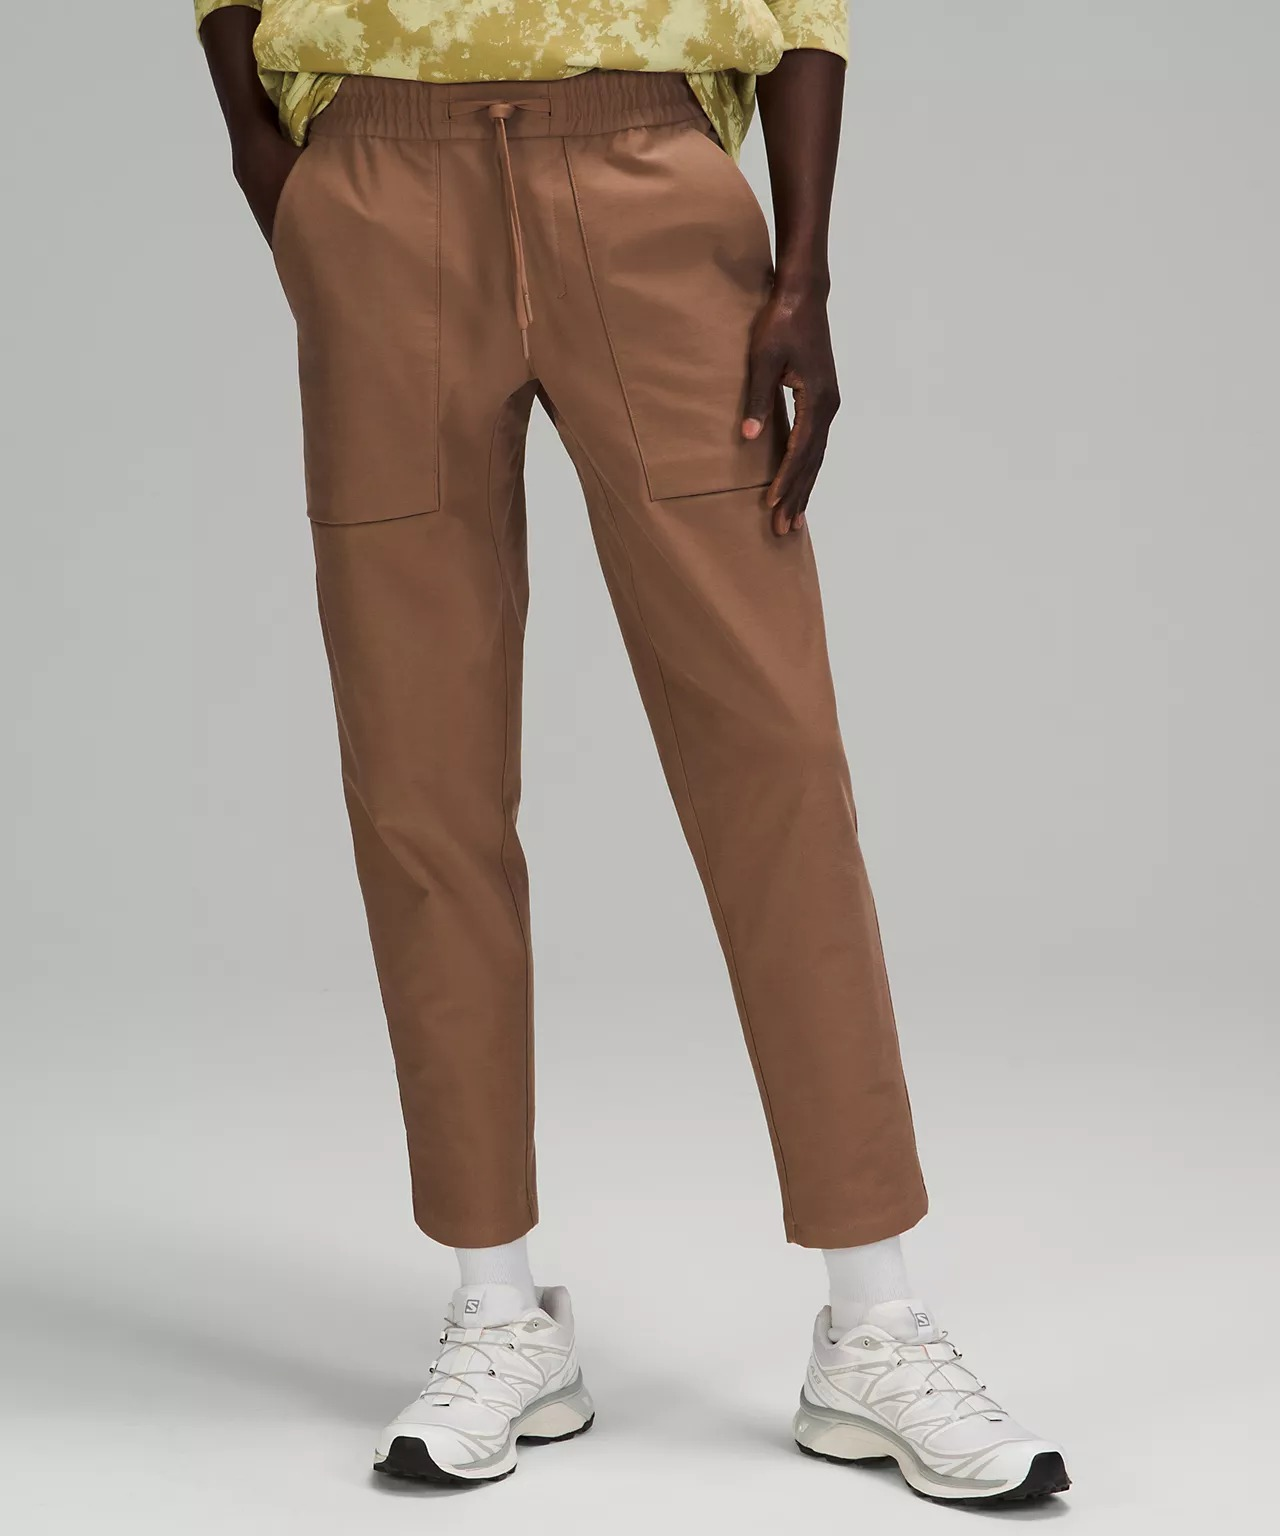 Lululemon Bowline Pant